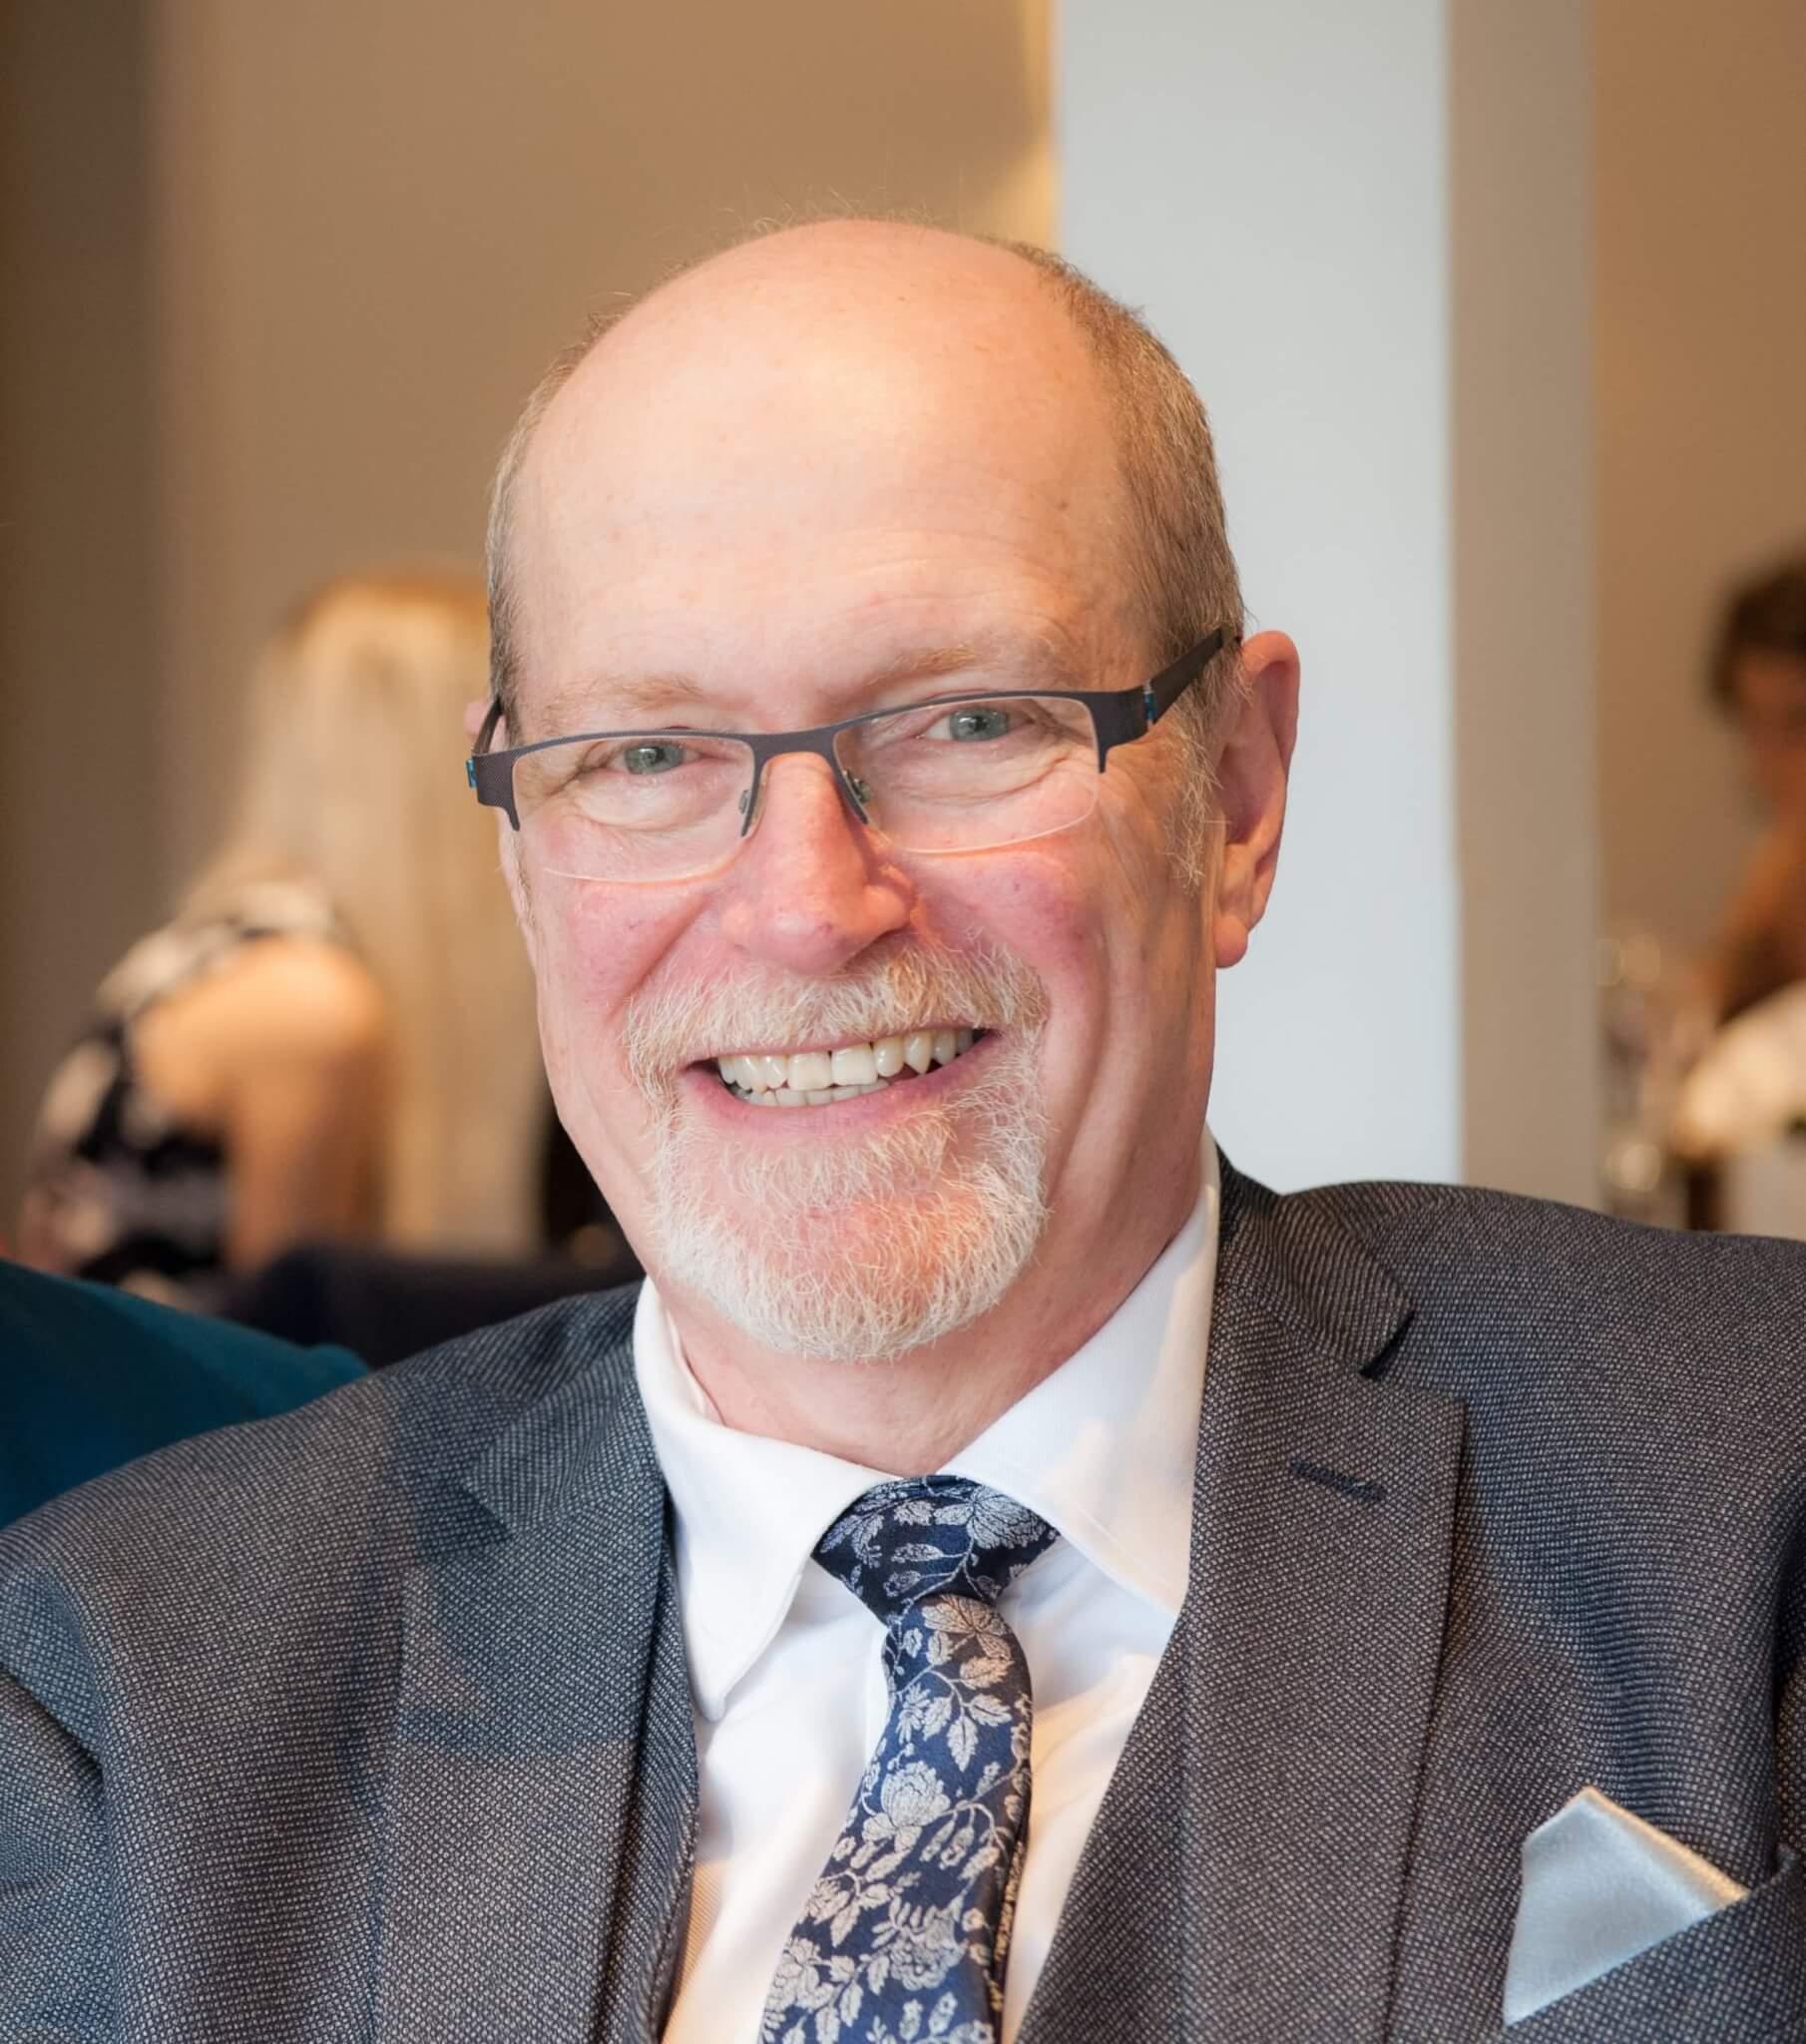 Alan Ashford